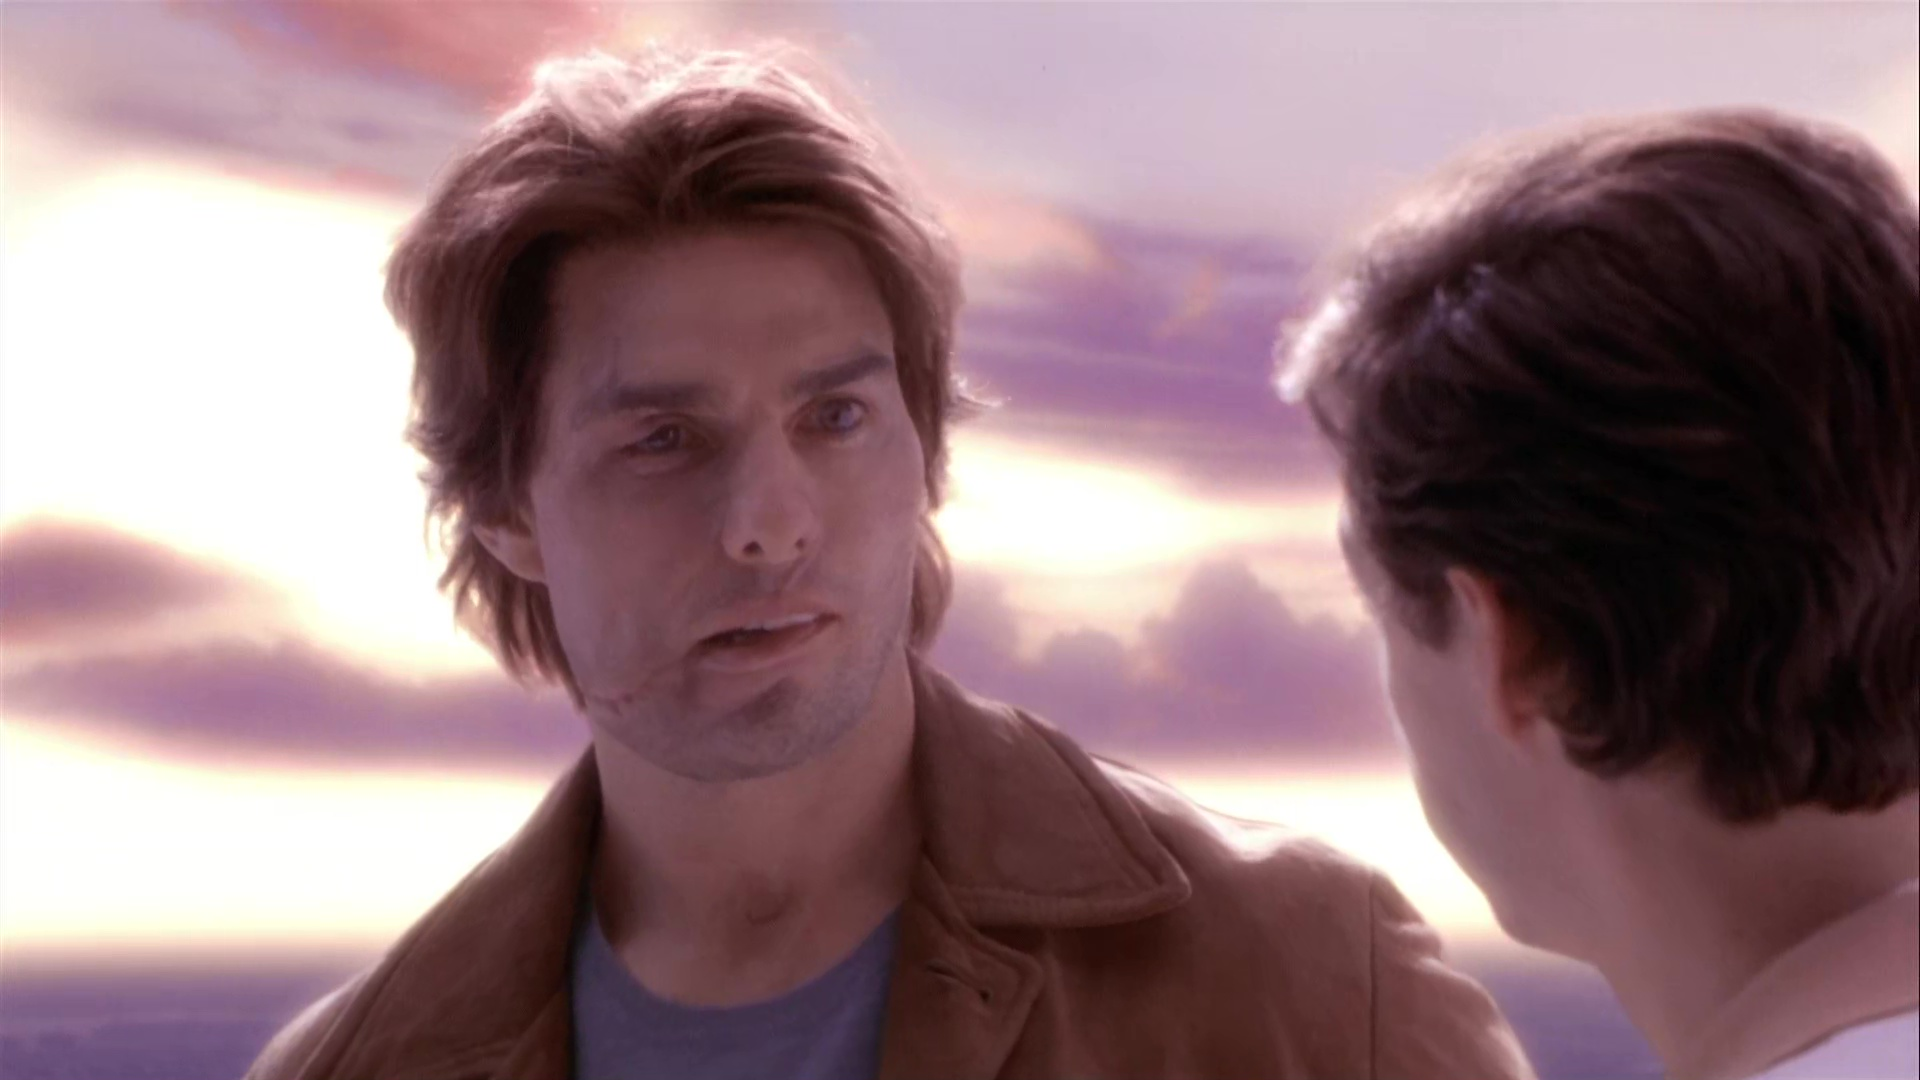 tom cruise dans Vanilla sky (2001) de Cameron Crowe